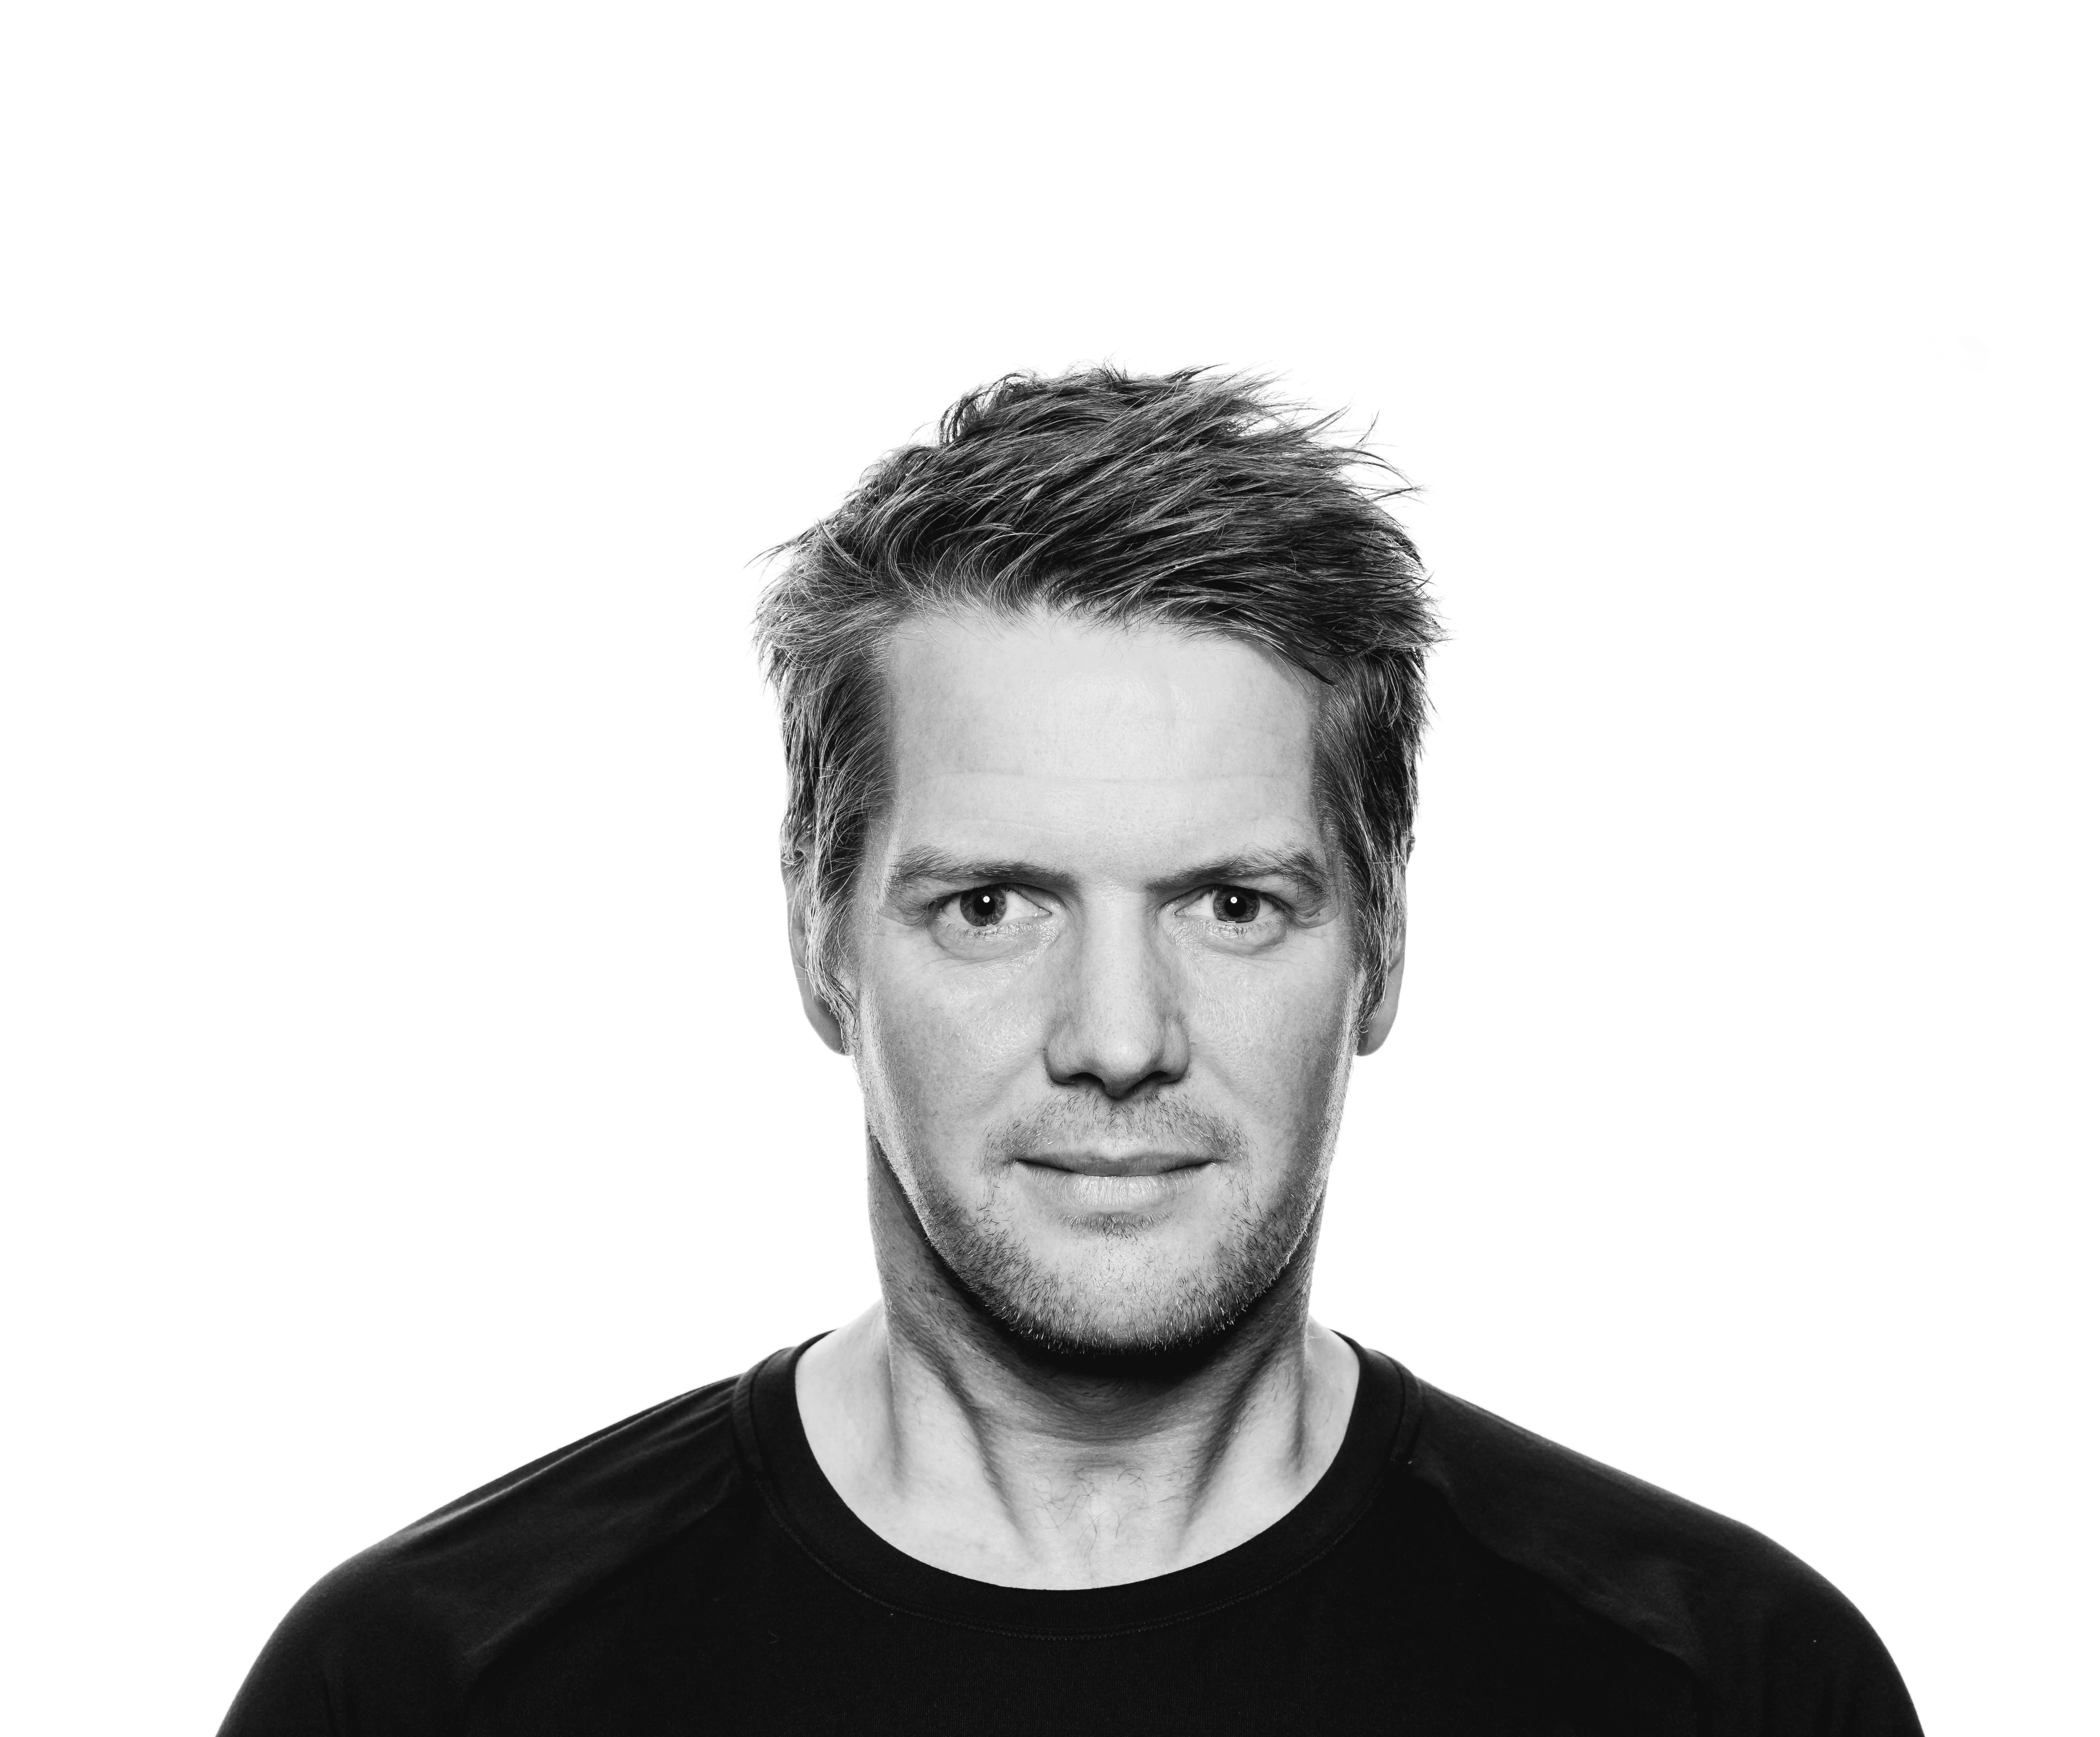 Jens Christian Grønlund